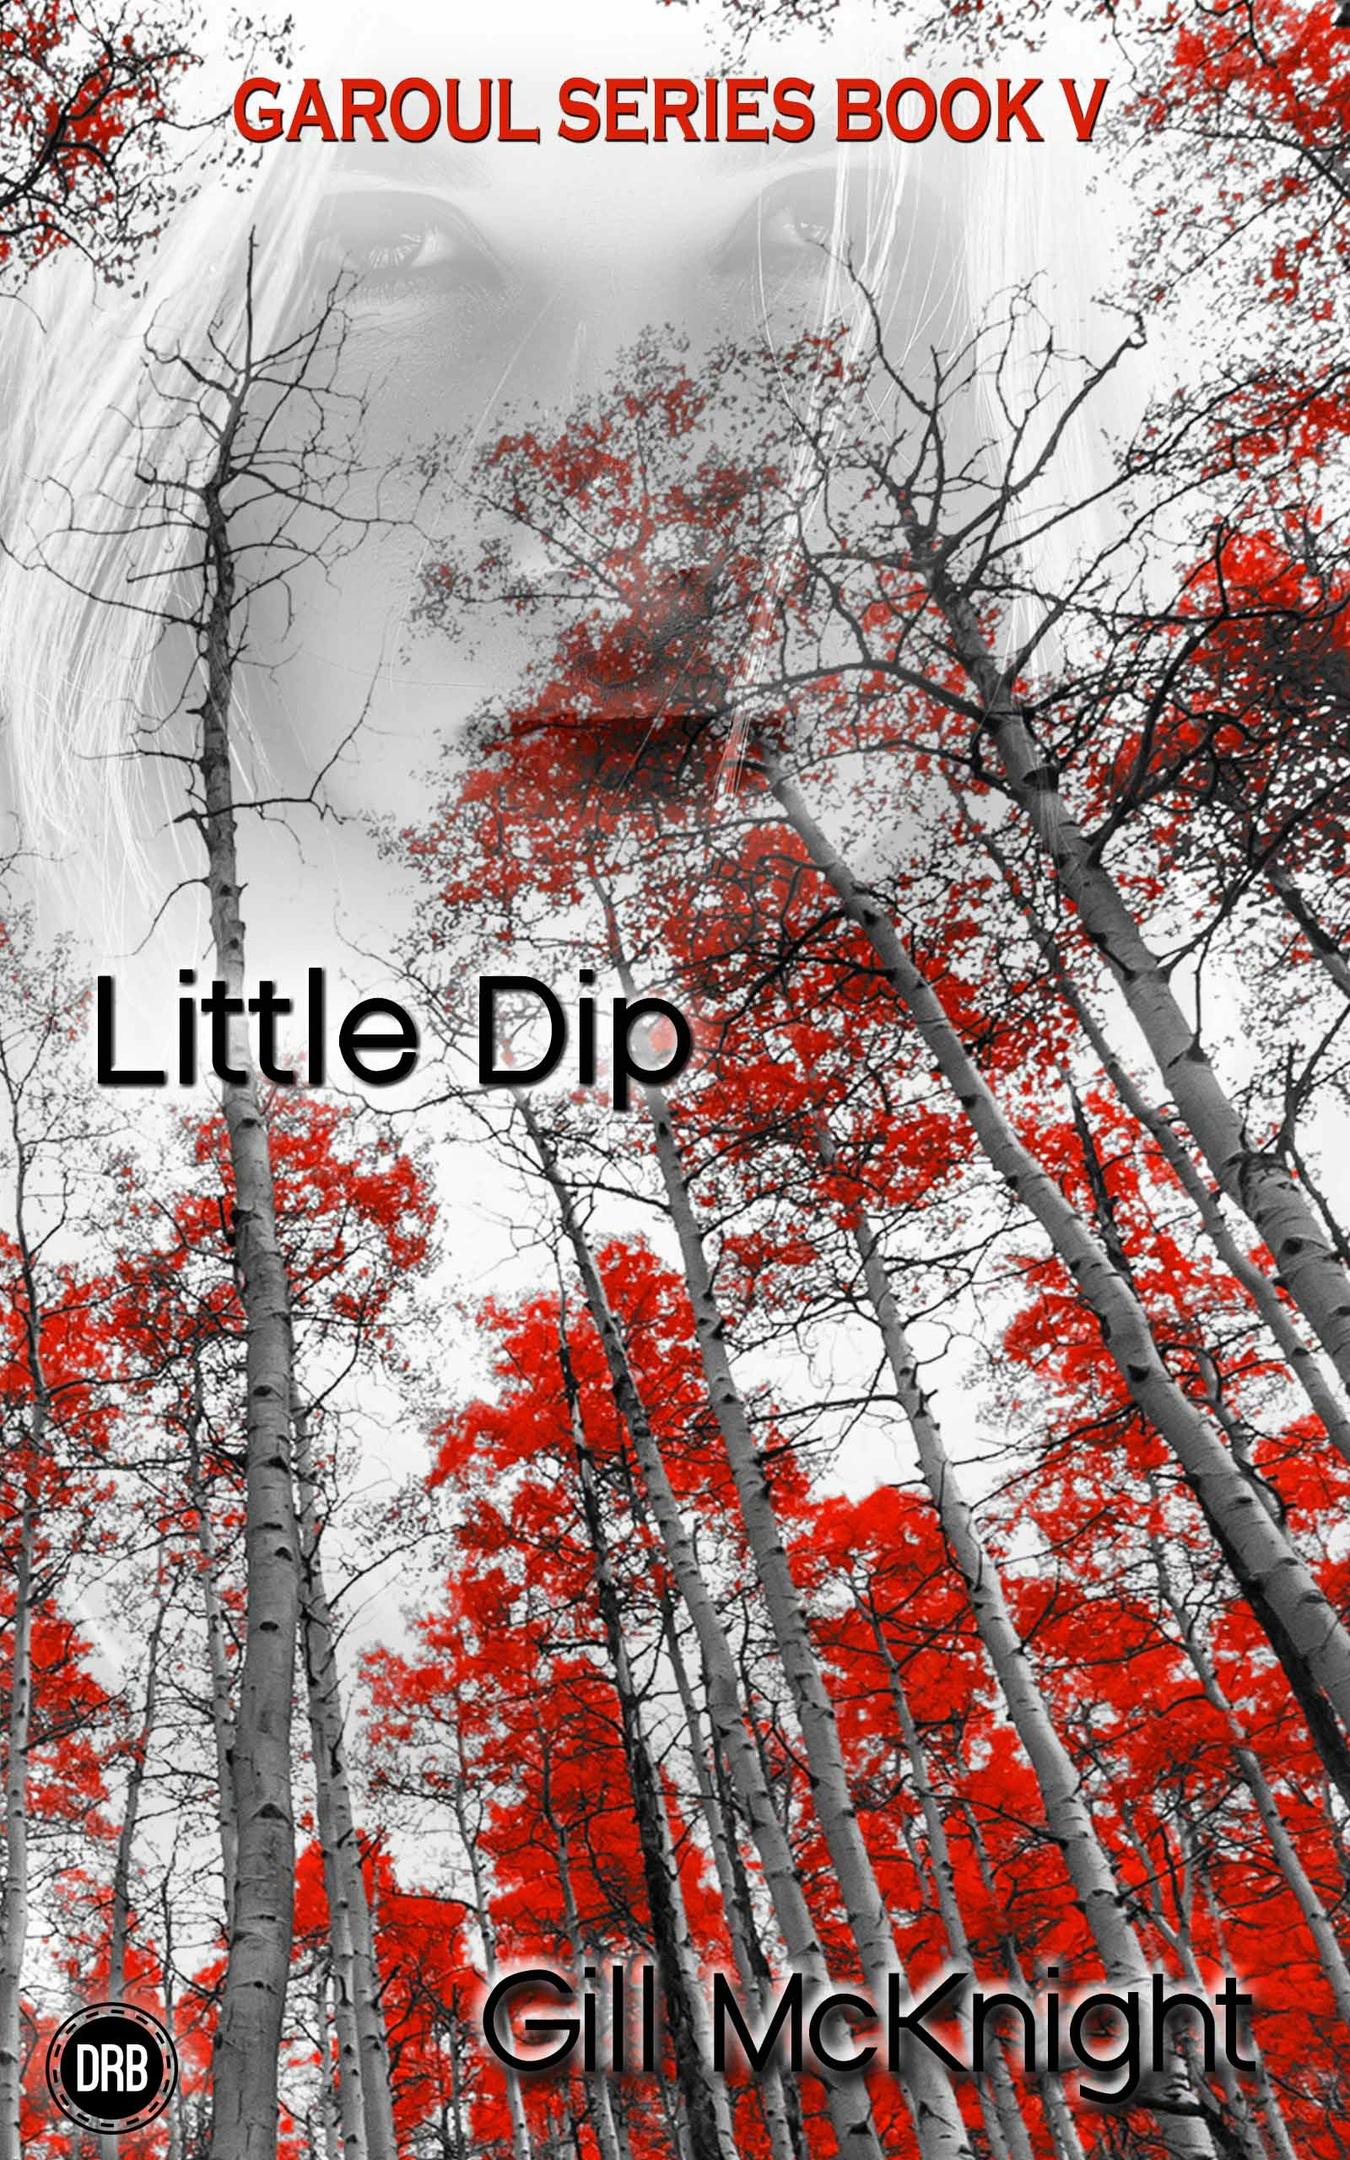 Little Dip by Gill McKnight - Garoul Series Book V (Mobi)